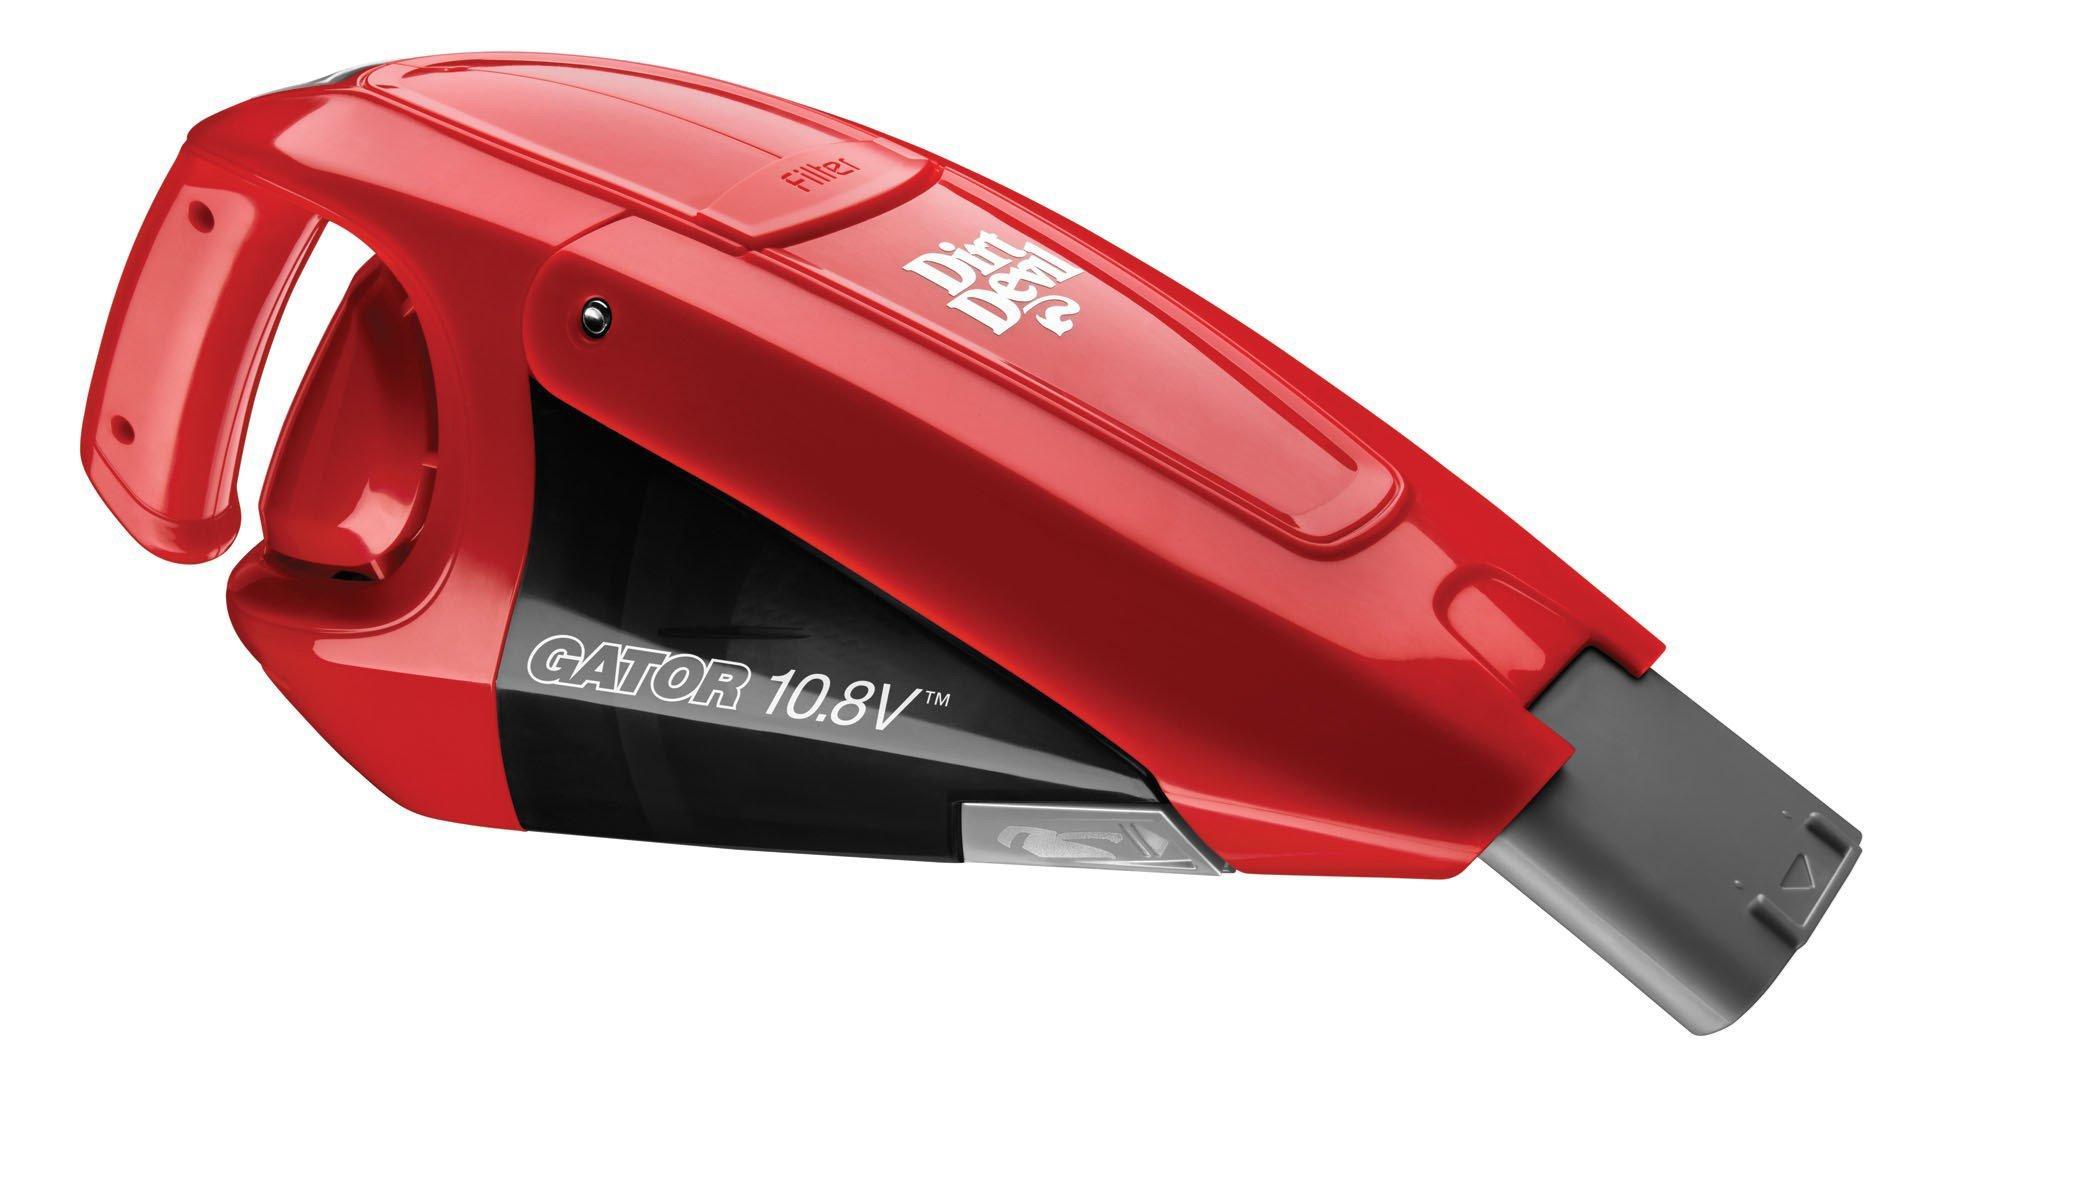 Reconditioned Gator 10.8V Cordless Bagless Handheld Vacuum2